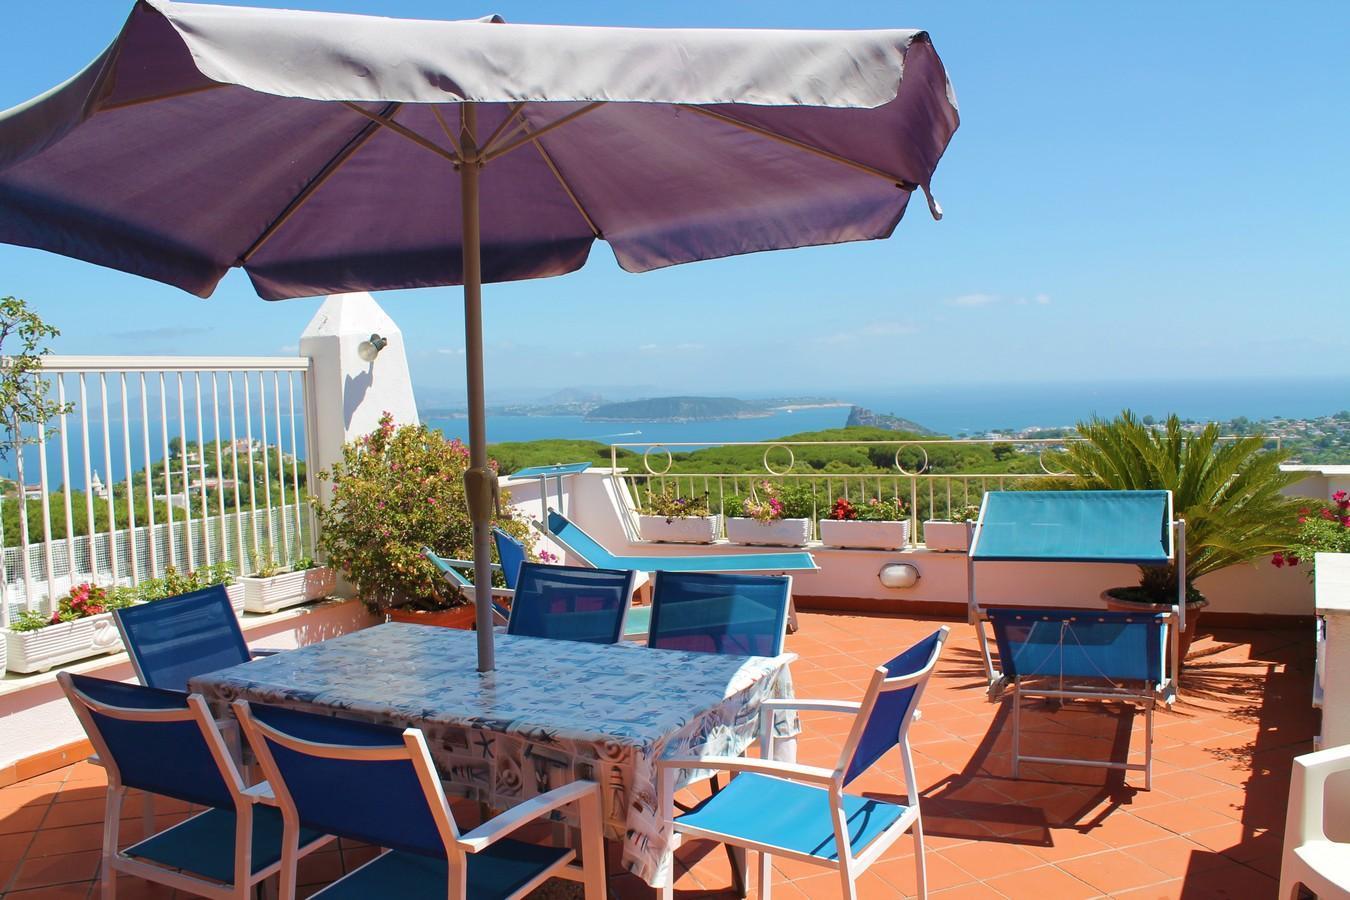 Villa La Favola Suite Ischia Terrace With View